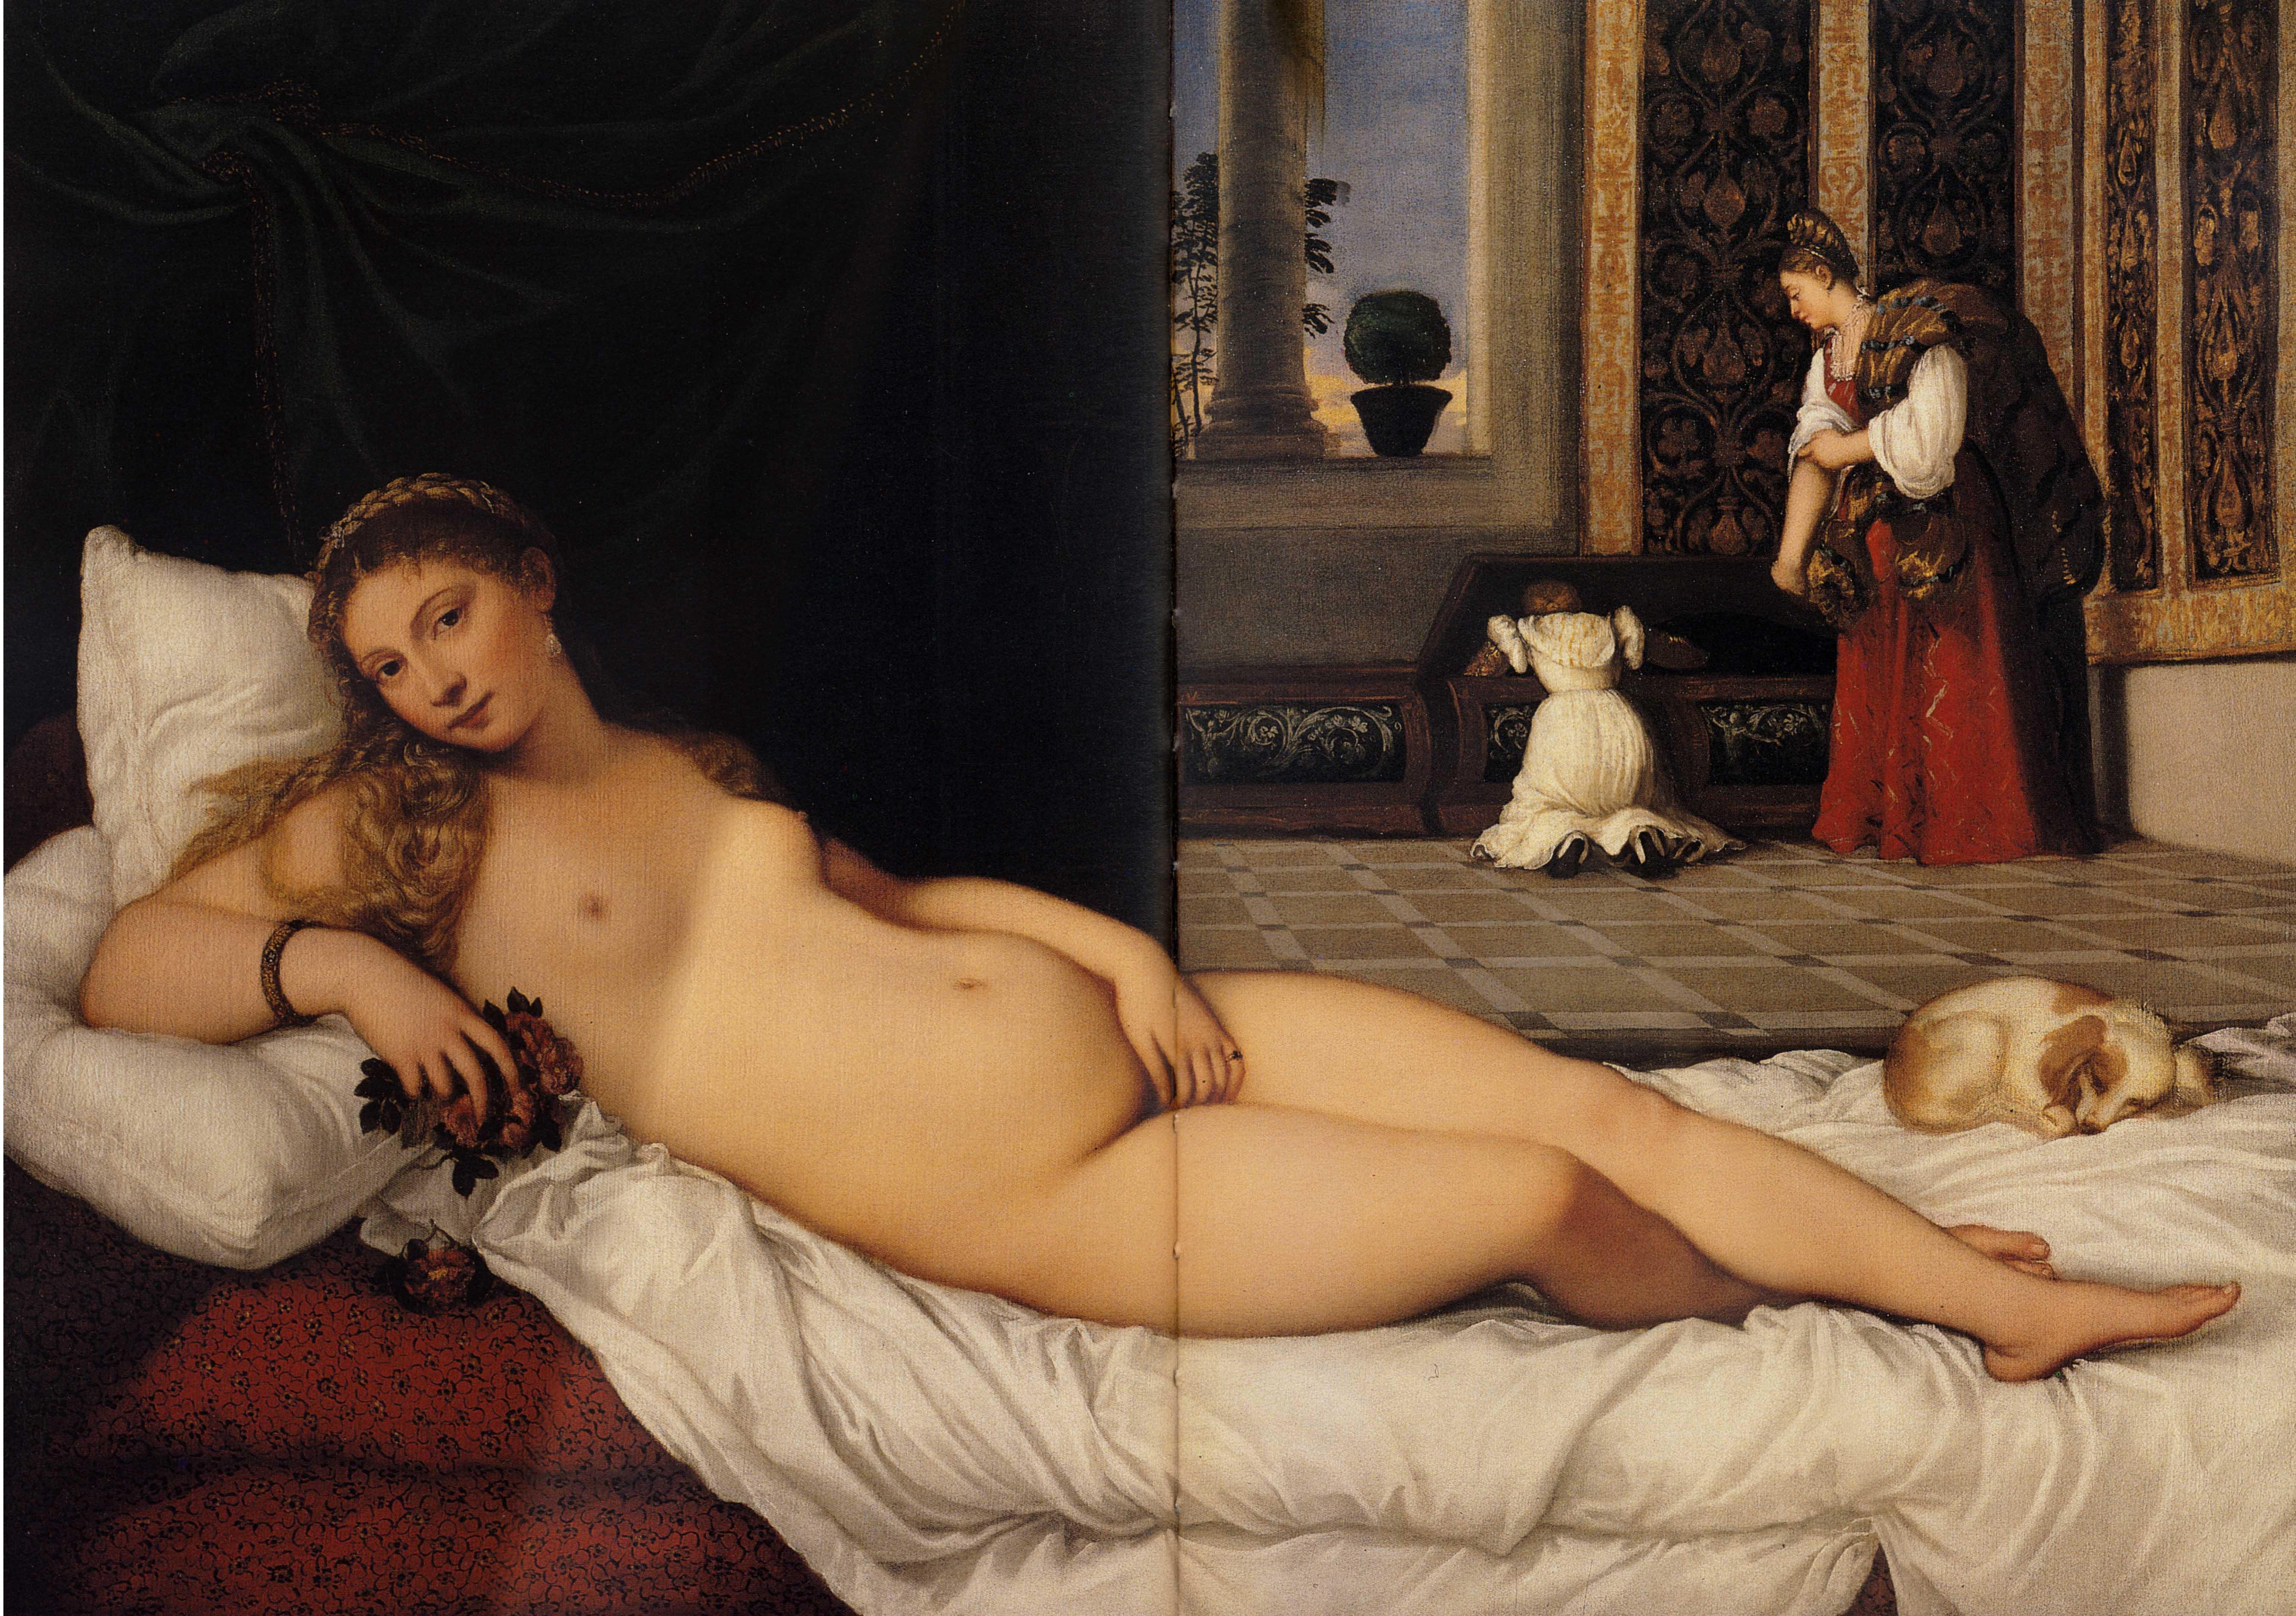 Урок мастурбации от англичанина 18 фотография